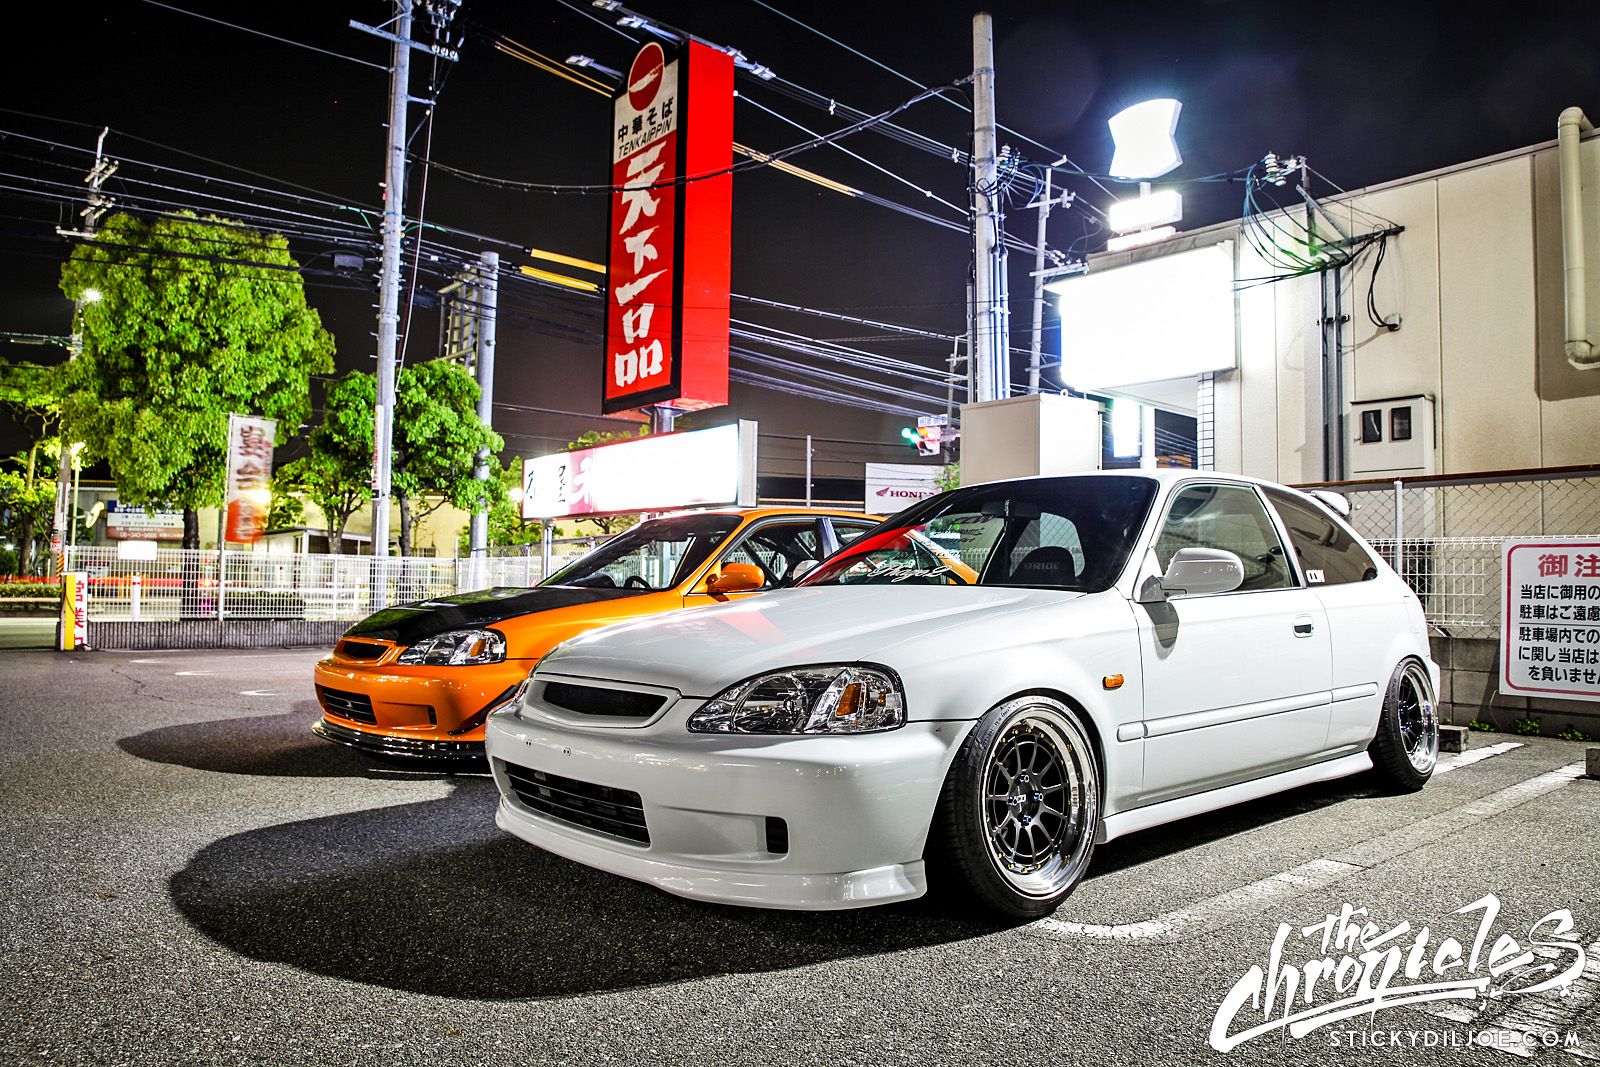 The Chronicles Vlog #7 (Part 2): Life in Osaka Ft. 9010design, AP Garage, and Garage Kiyotaki…